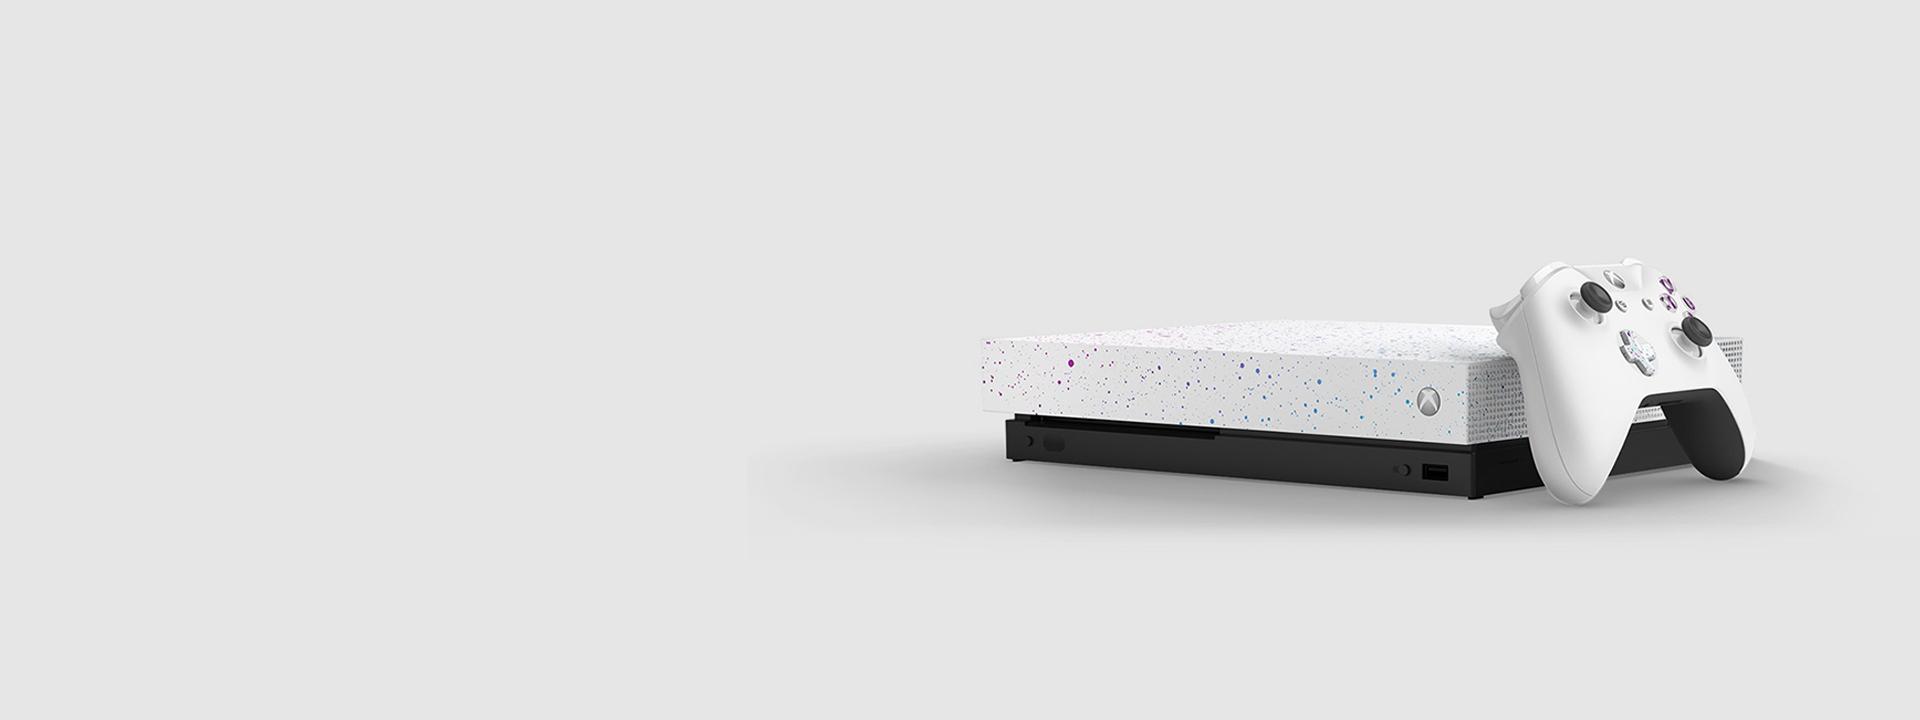 Xbox One X 1TB 超时空特别版